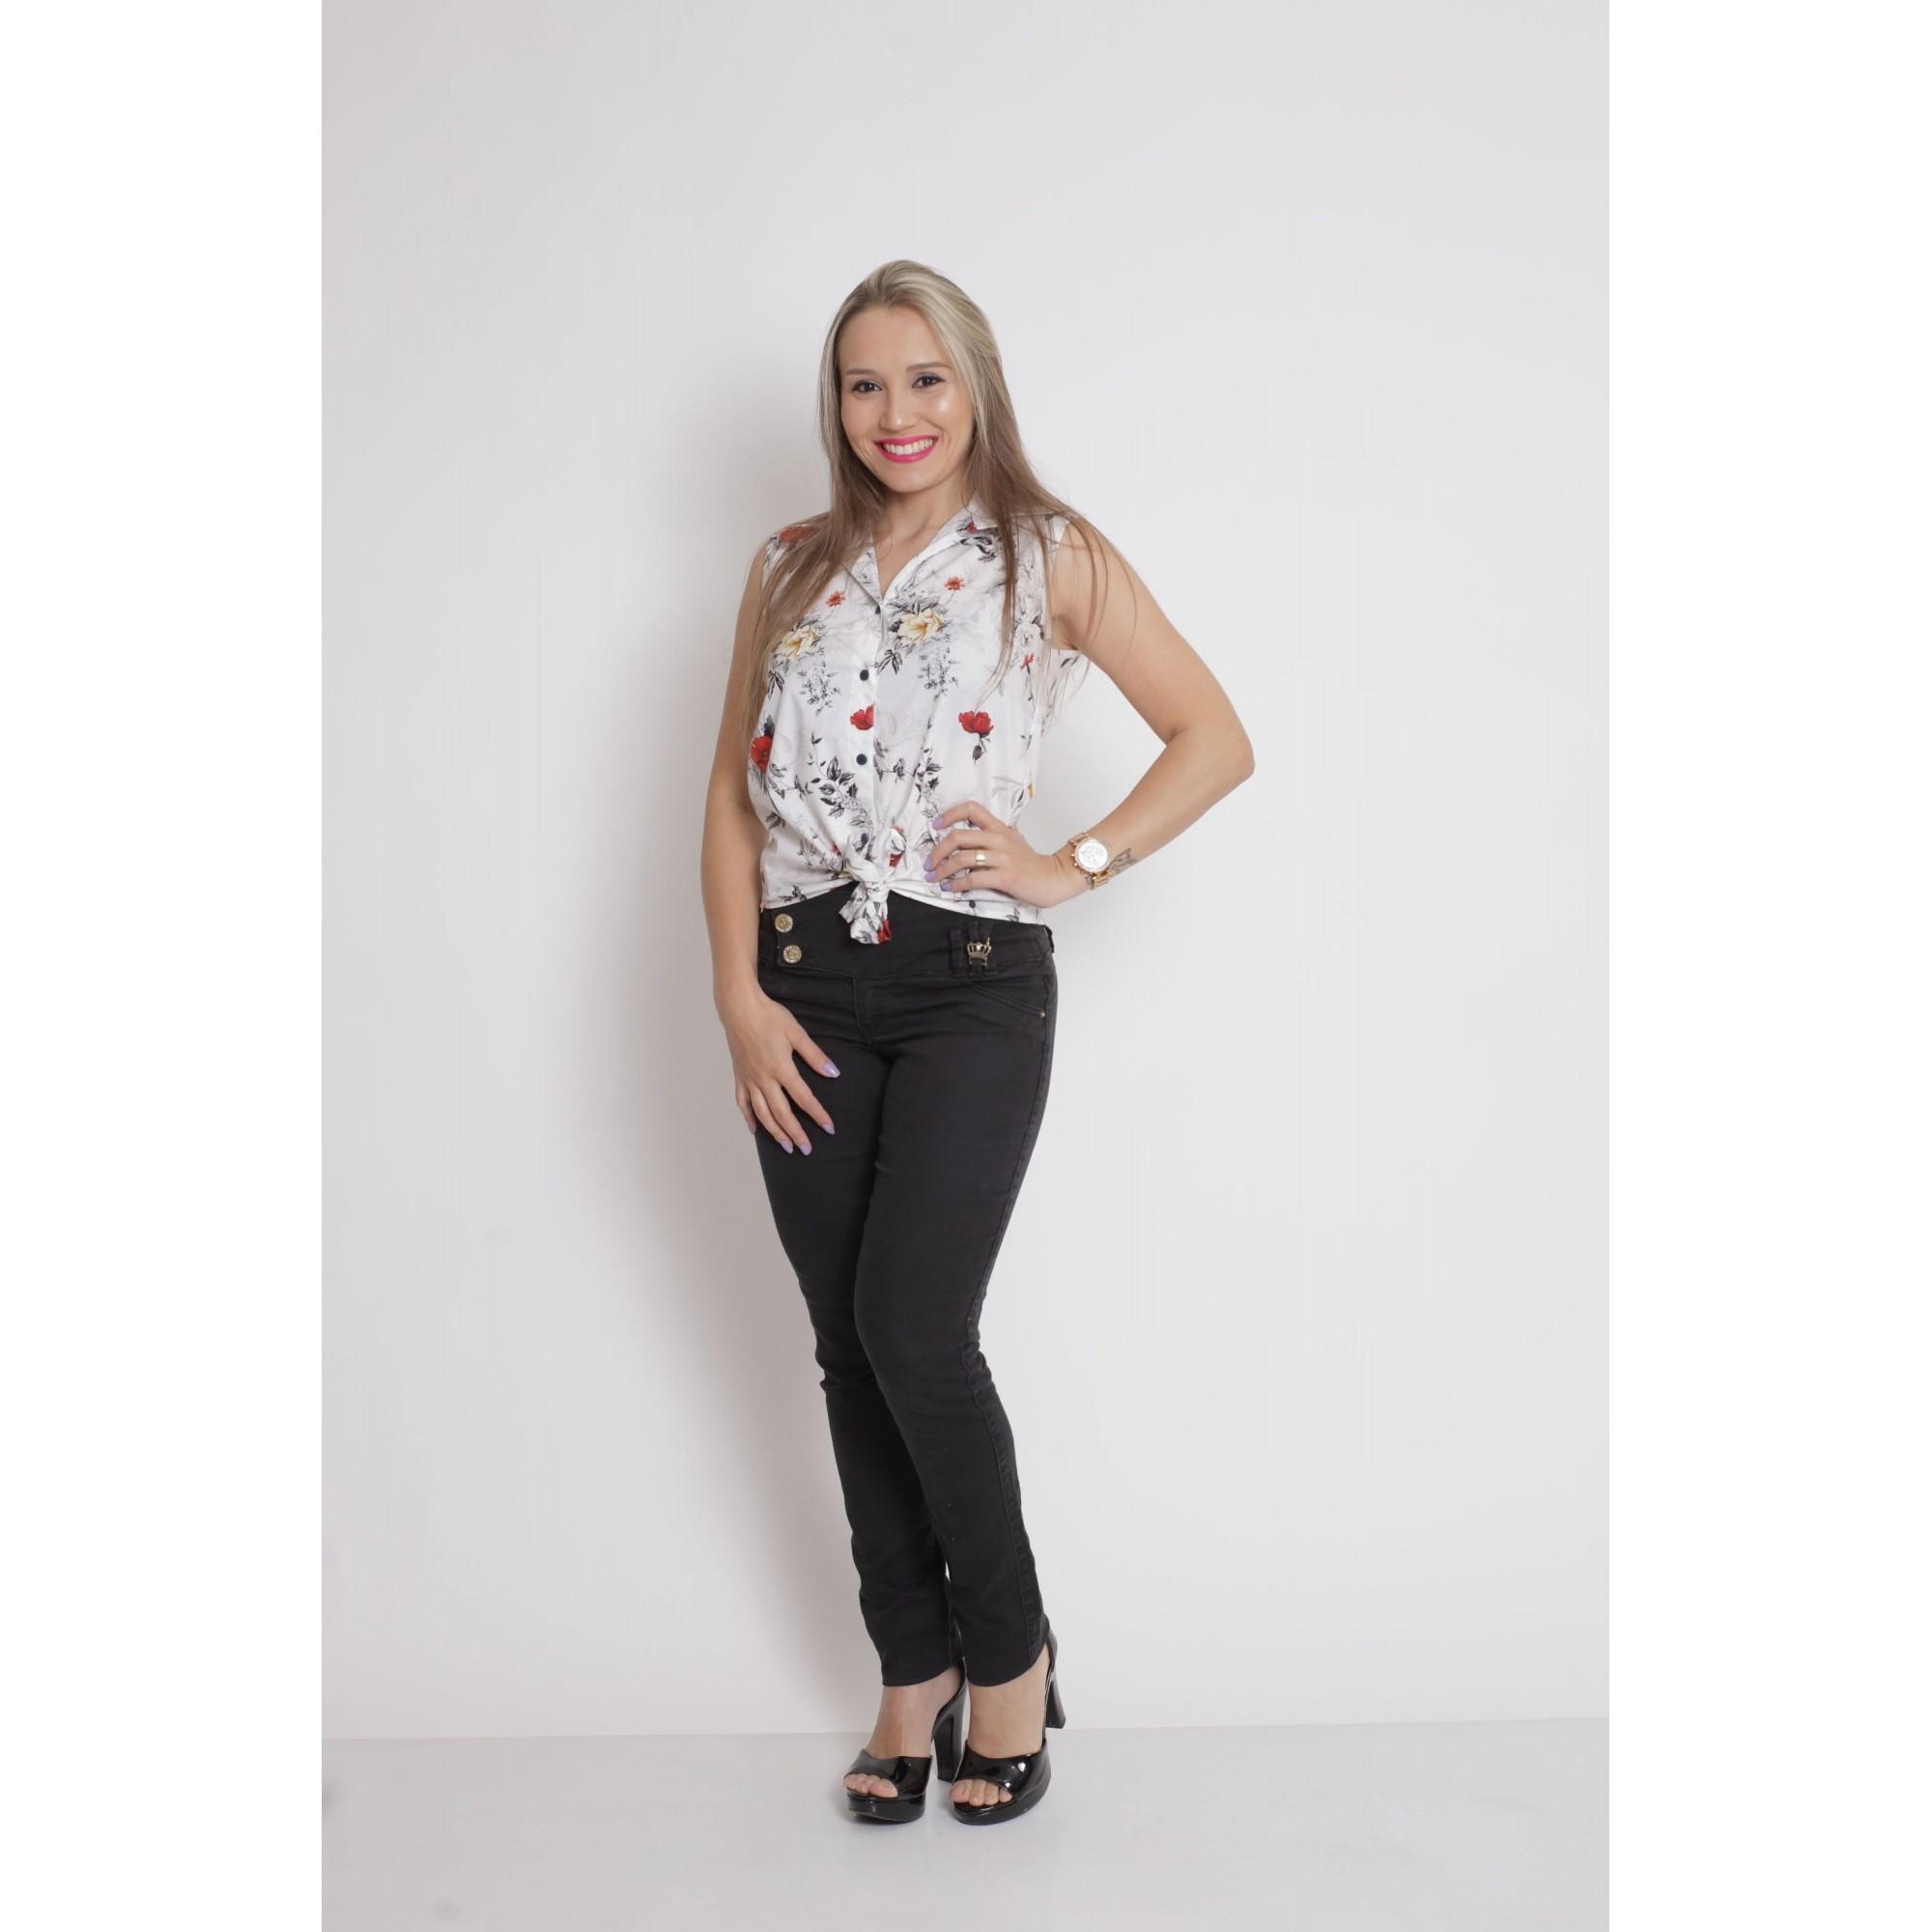 Camisa Social Sem Manga Branca Floral Feminina  - Heitor Fashion Brazil